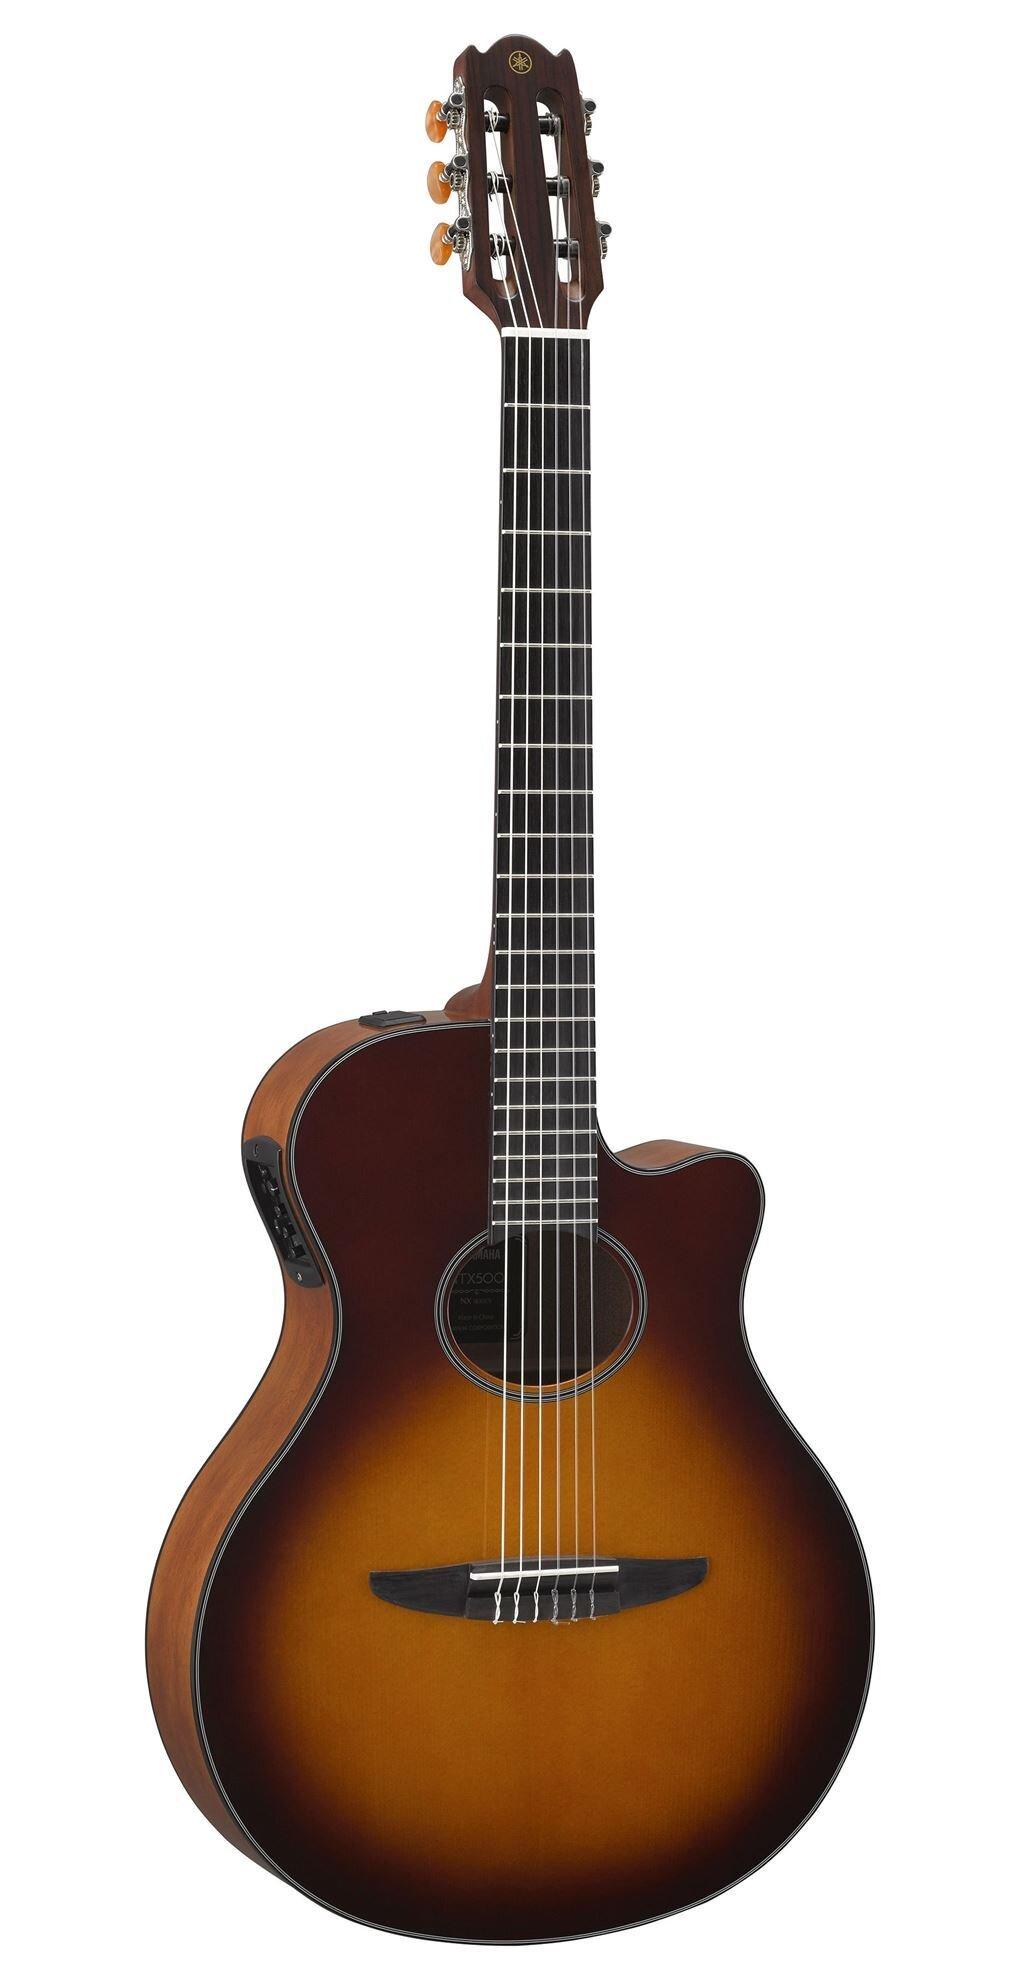 Đàn guitar Yamaha NTX500C